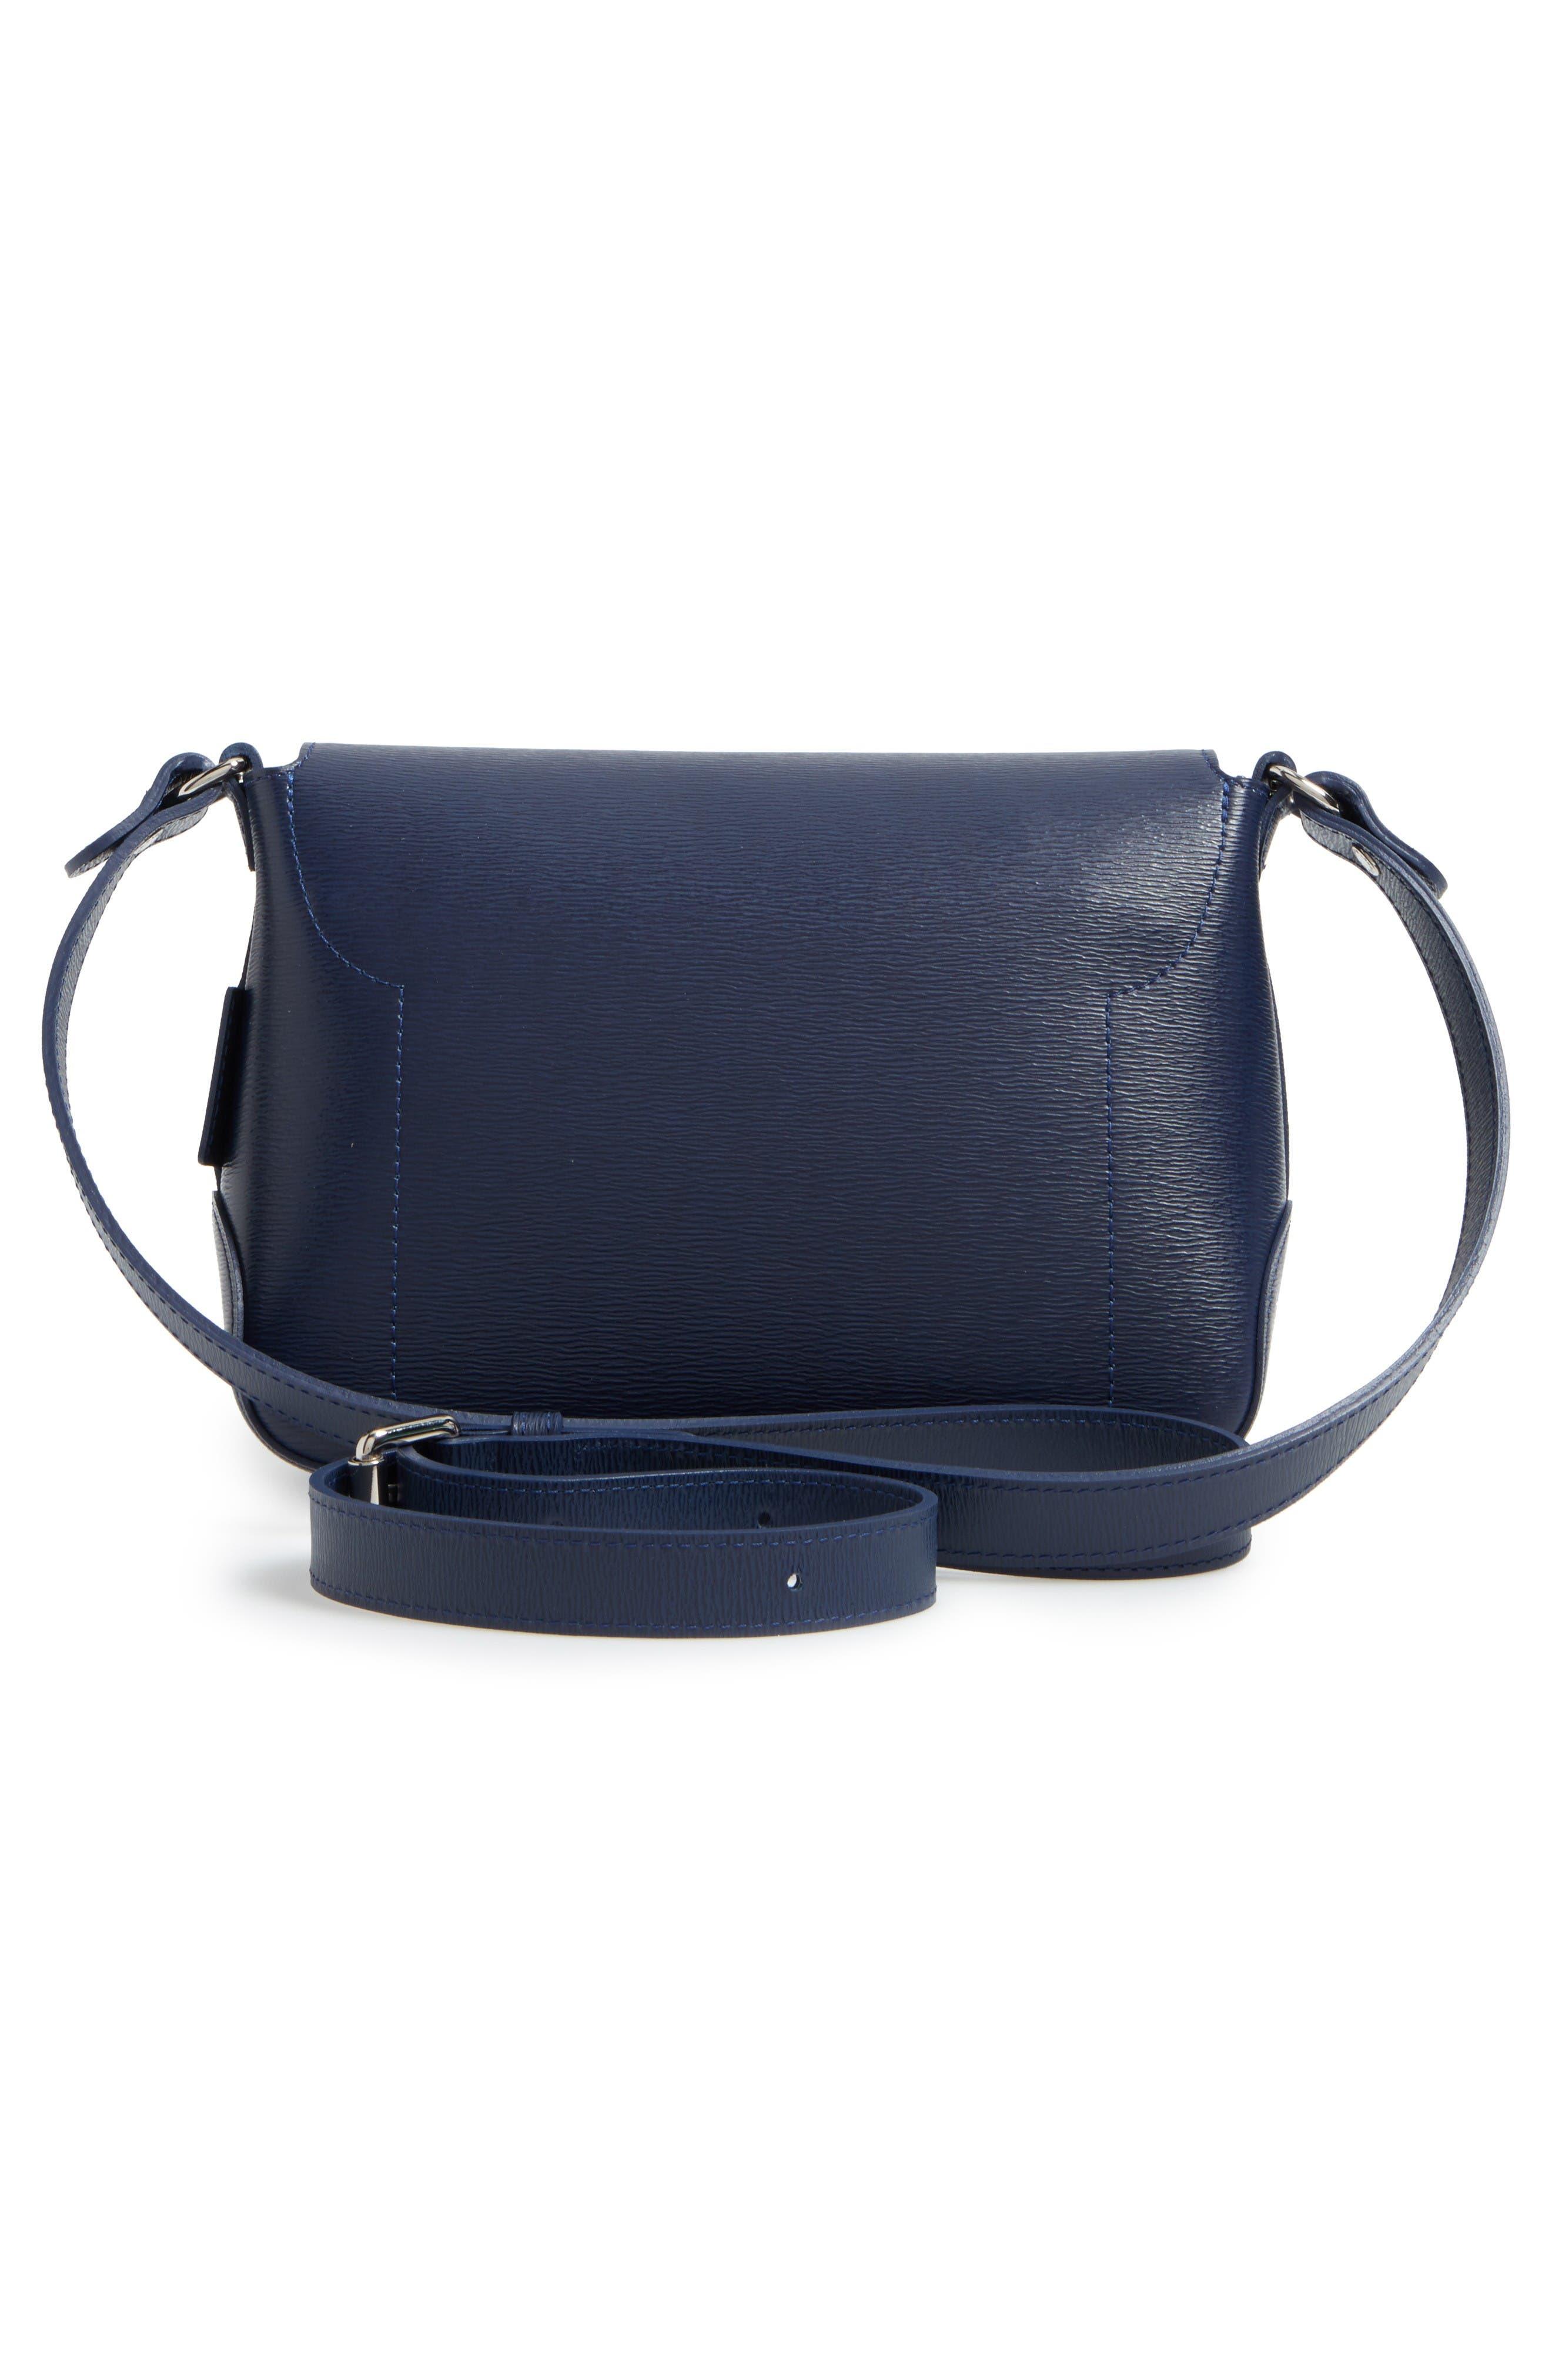 Roseau Leather Crossbody Bag,                             Alternate thumbnail 3, color,                             Navy